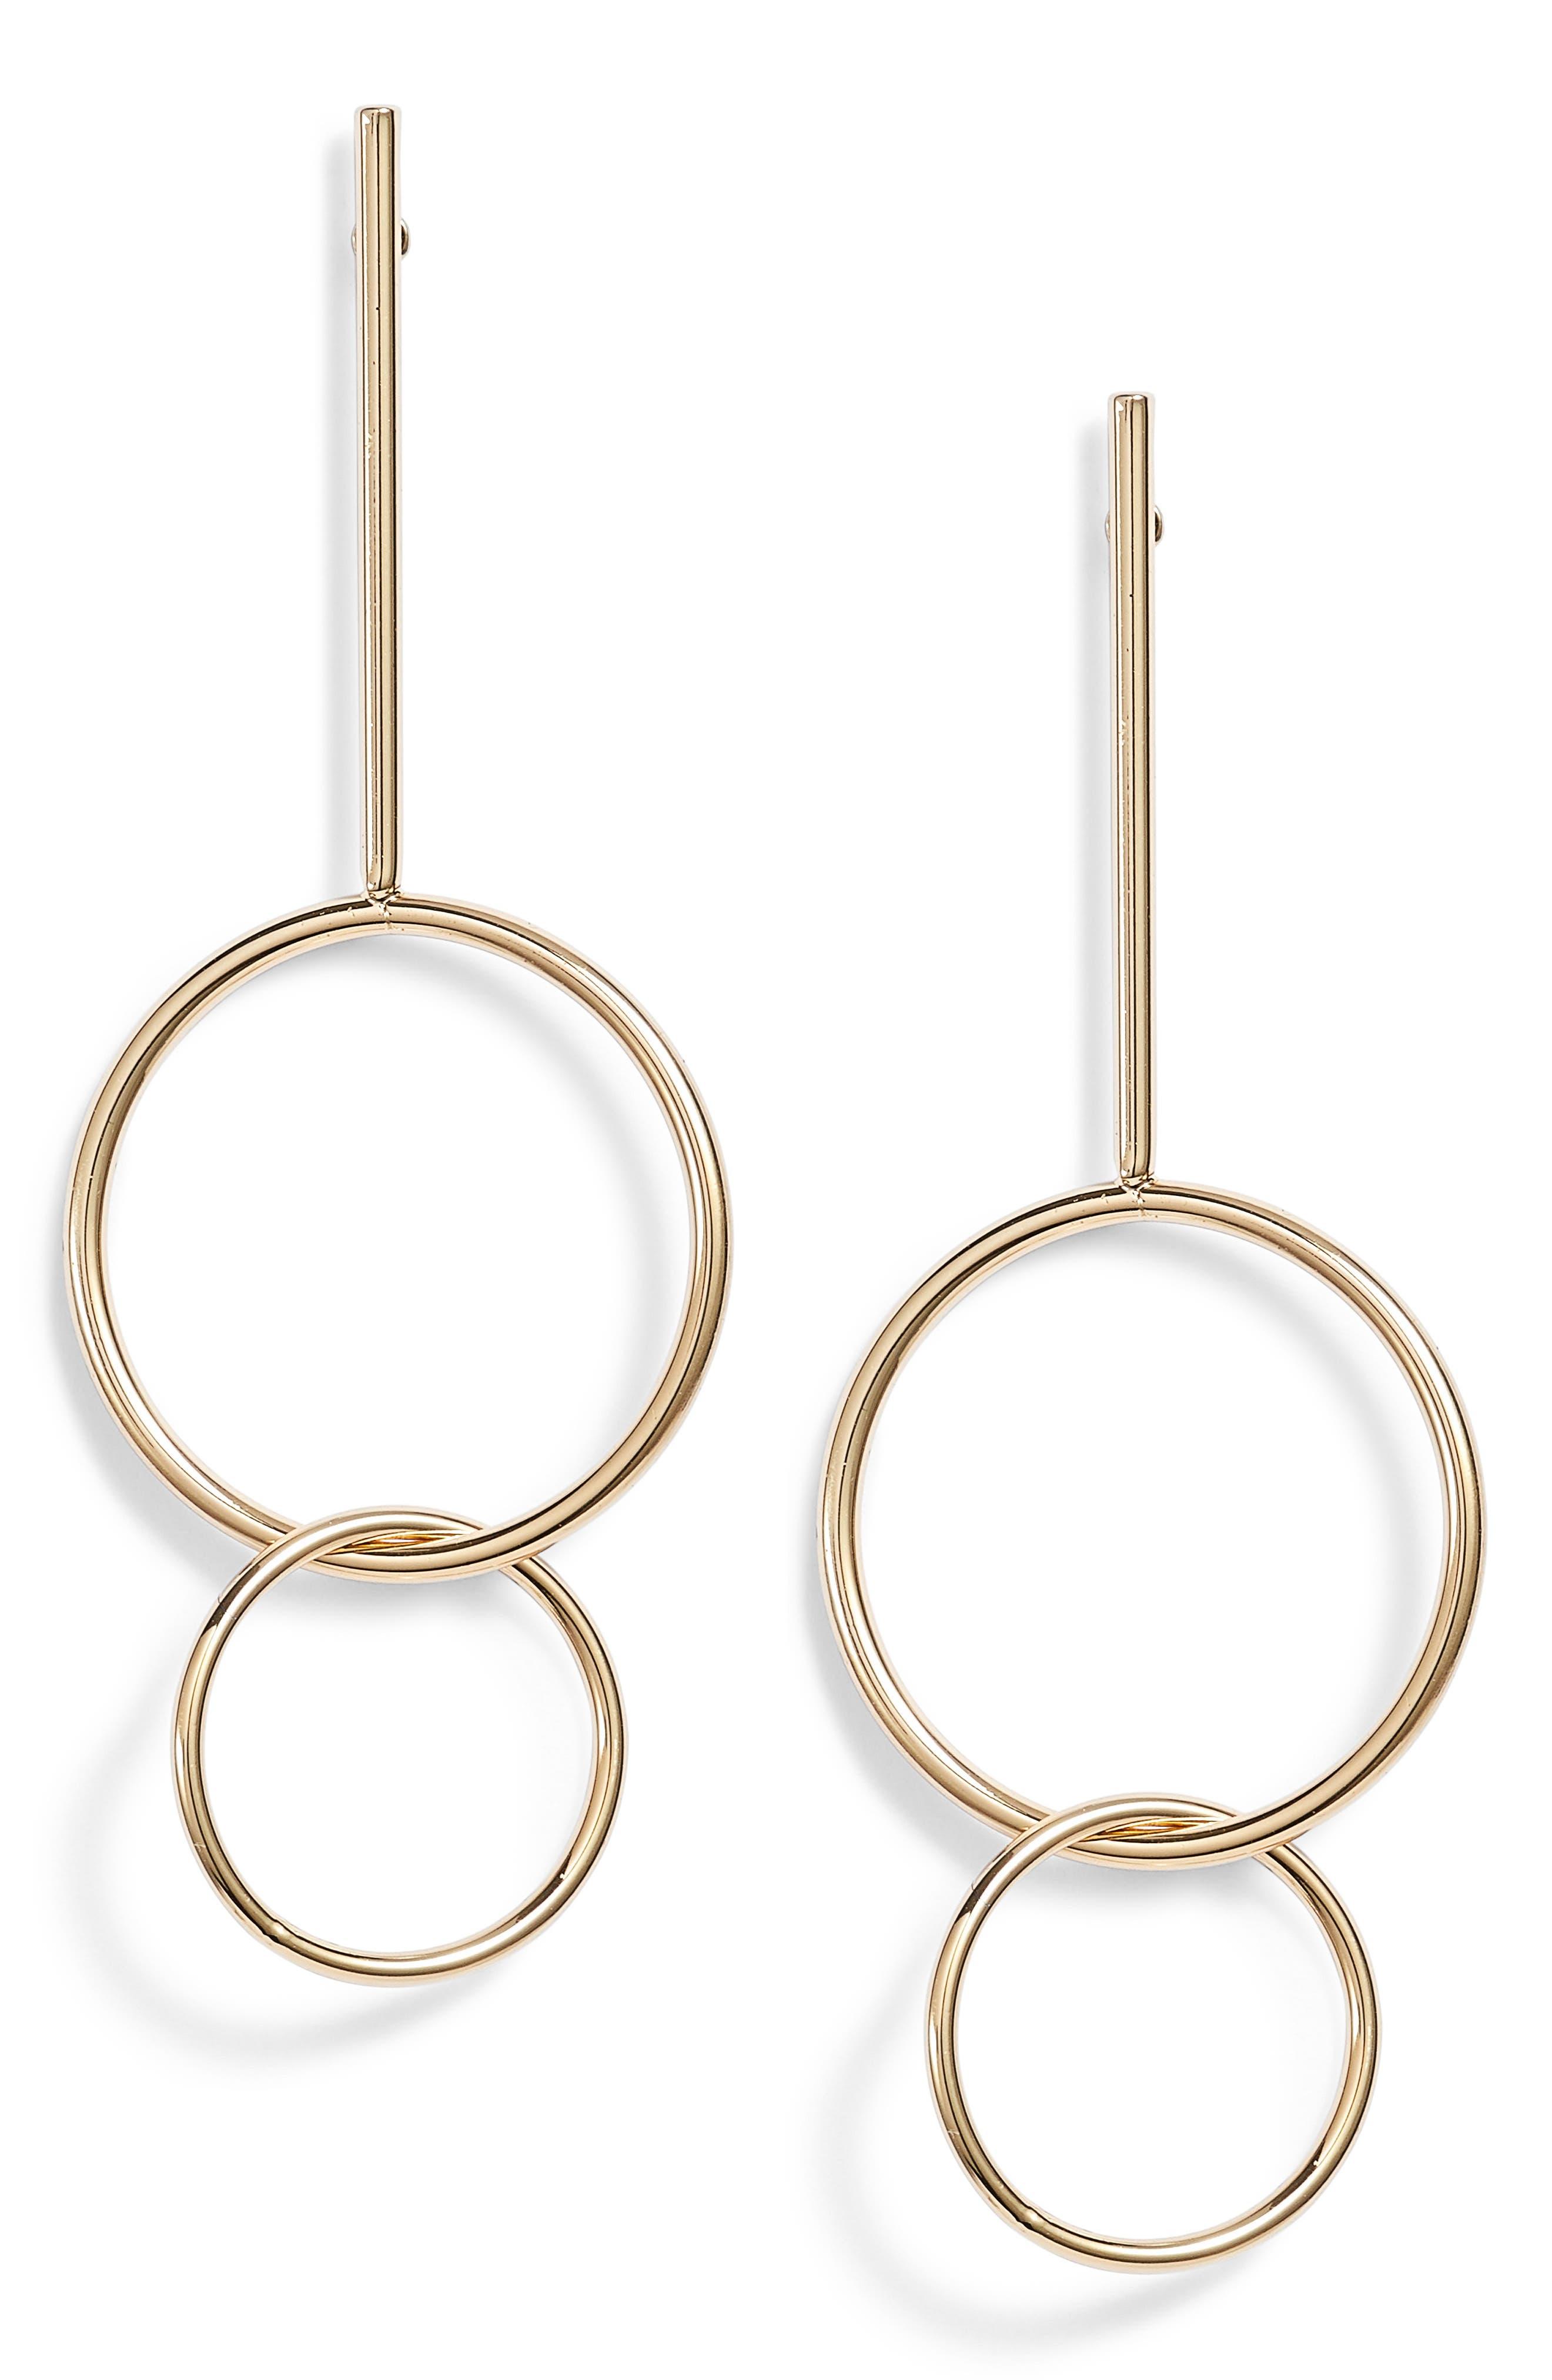 Orbit Ring Linear Earrings,                         Main,                         color, Gold